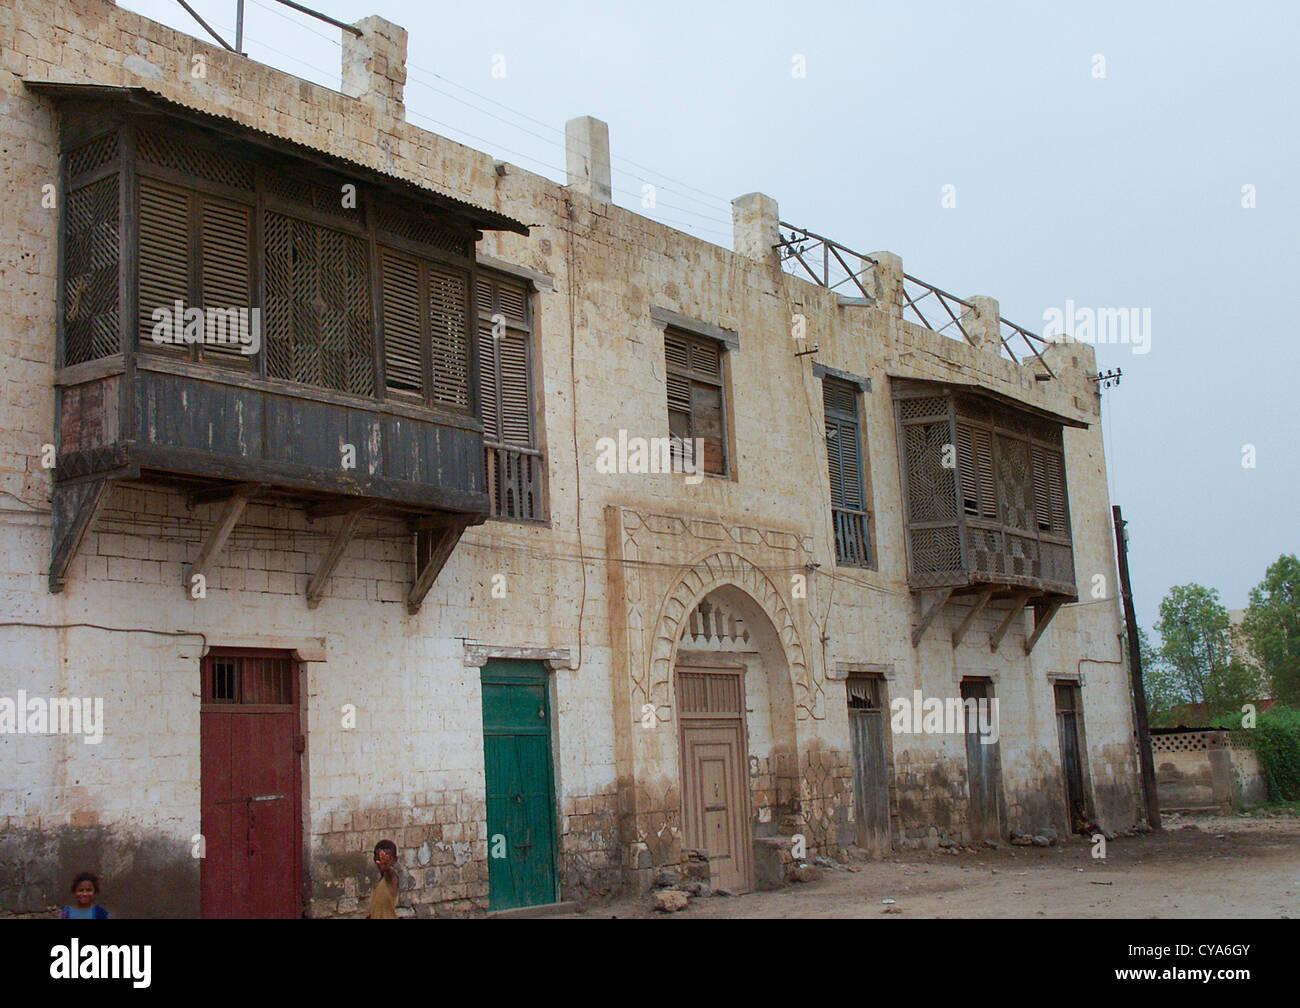 Moucharabieh On An Ottoman Building In Massawa, Eritrea Stock Photo